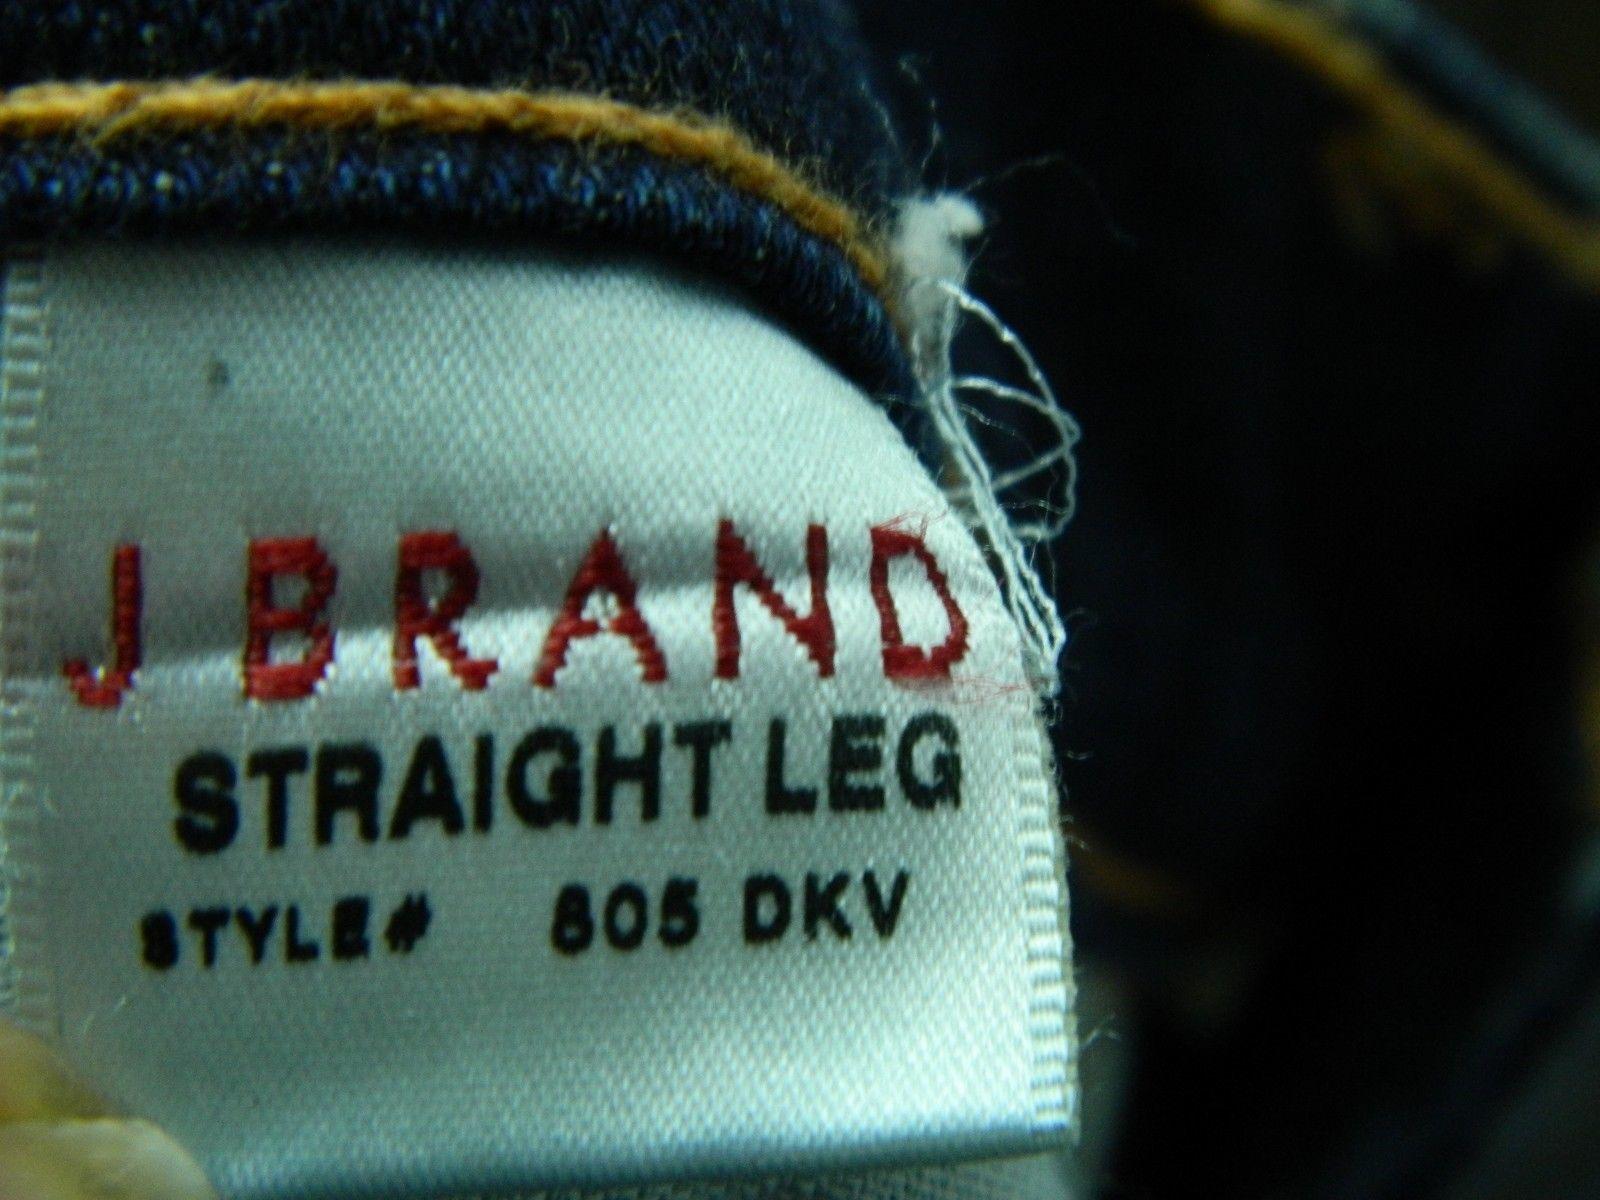 J Brand Jeans Straight Leg Jeans  Dark Wash Style #805 Size 25 image 10